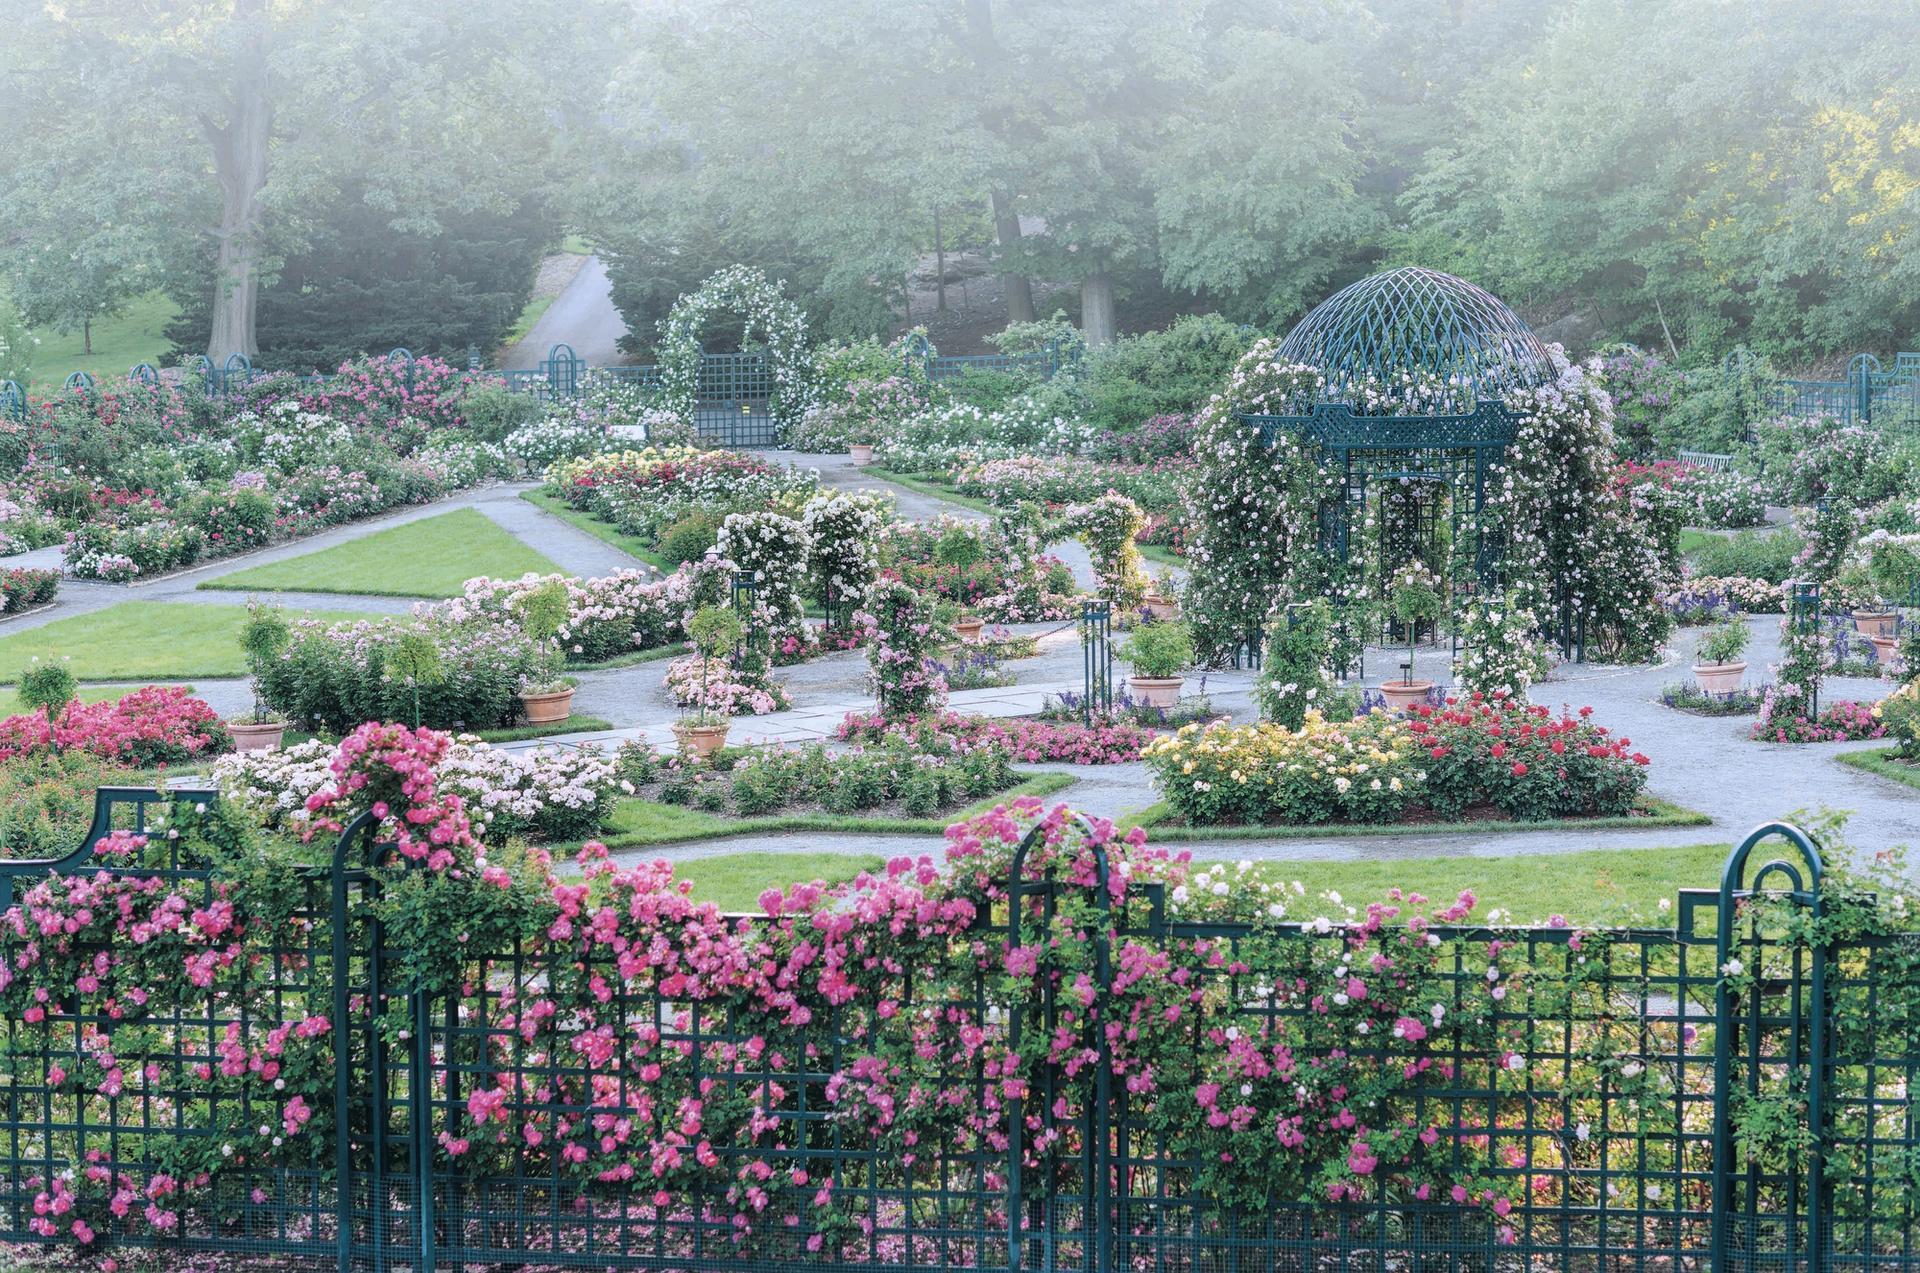 The Peggy Rockefeller Rose Garden in the New York Botanical Garden © 2019 Georgianna Lane